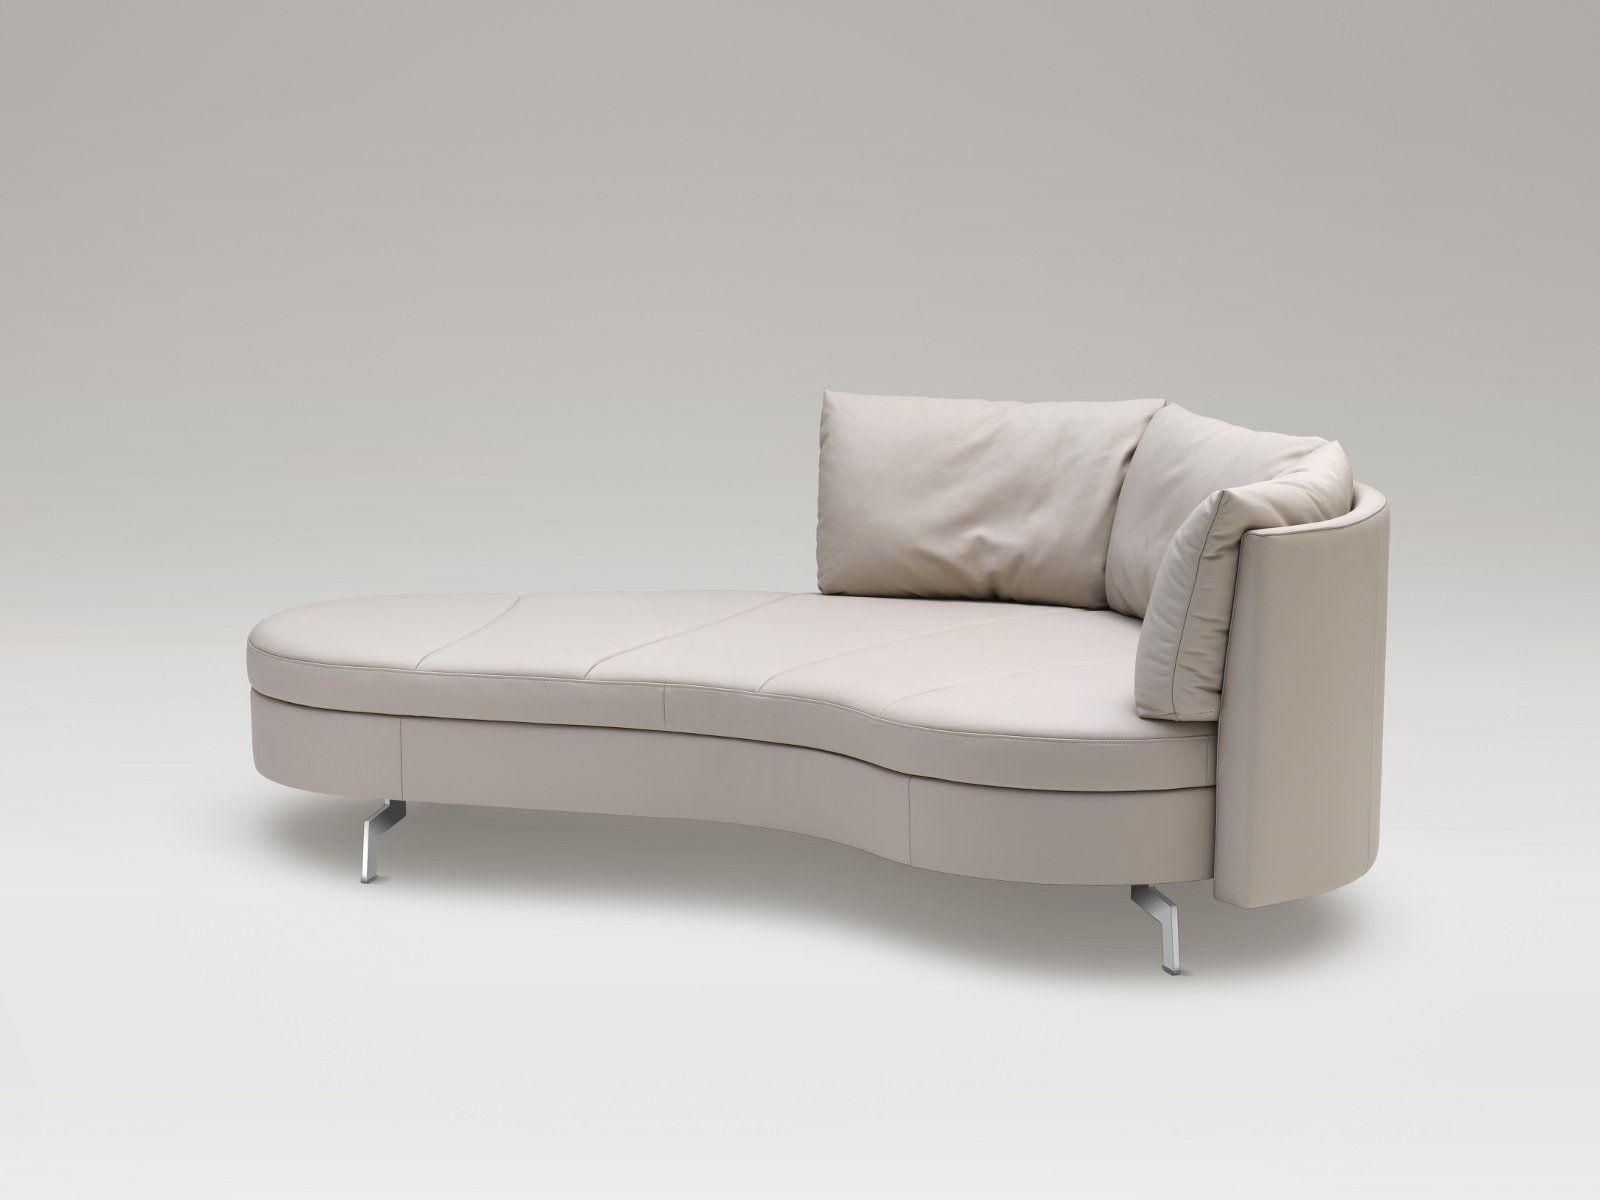 ds 167 sofa by de sede design hugo de ruiter. Black Bedroom Furniture Sets. Home Design Ideas